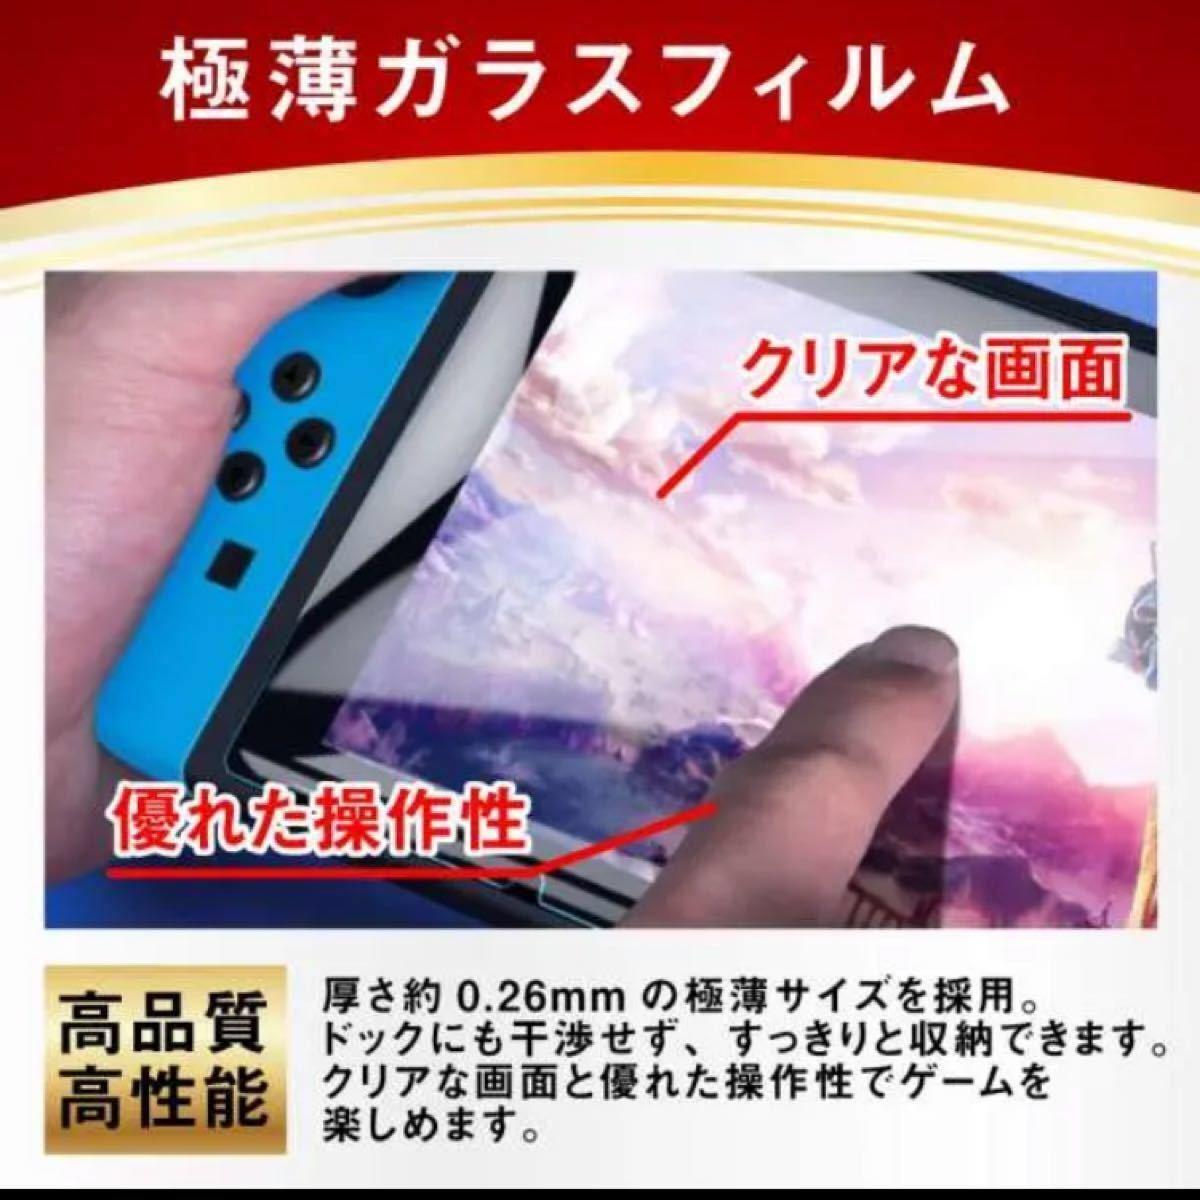 Nintendo Switch ニンテンドースイッチ 任天堂スイッチ 強化ガラスフィルム 保護フィルム ゲーム用品